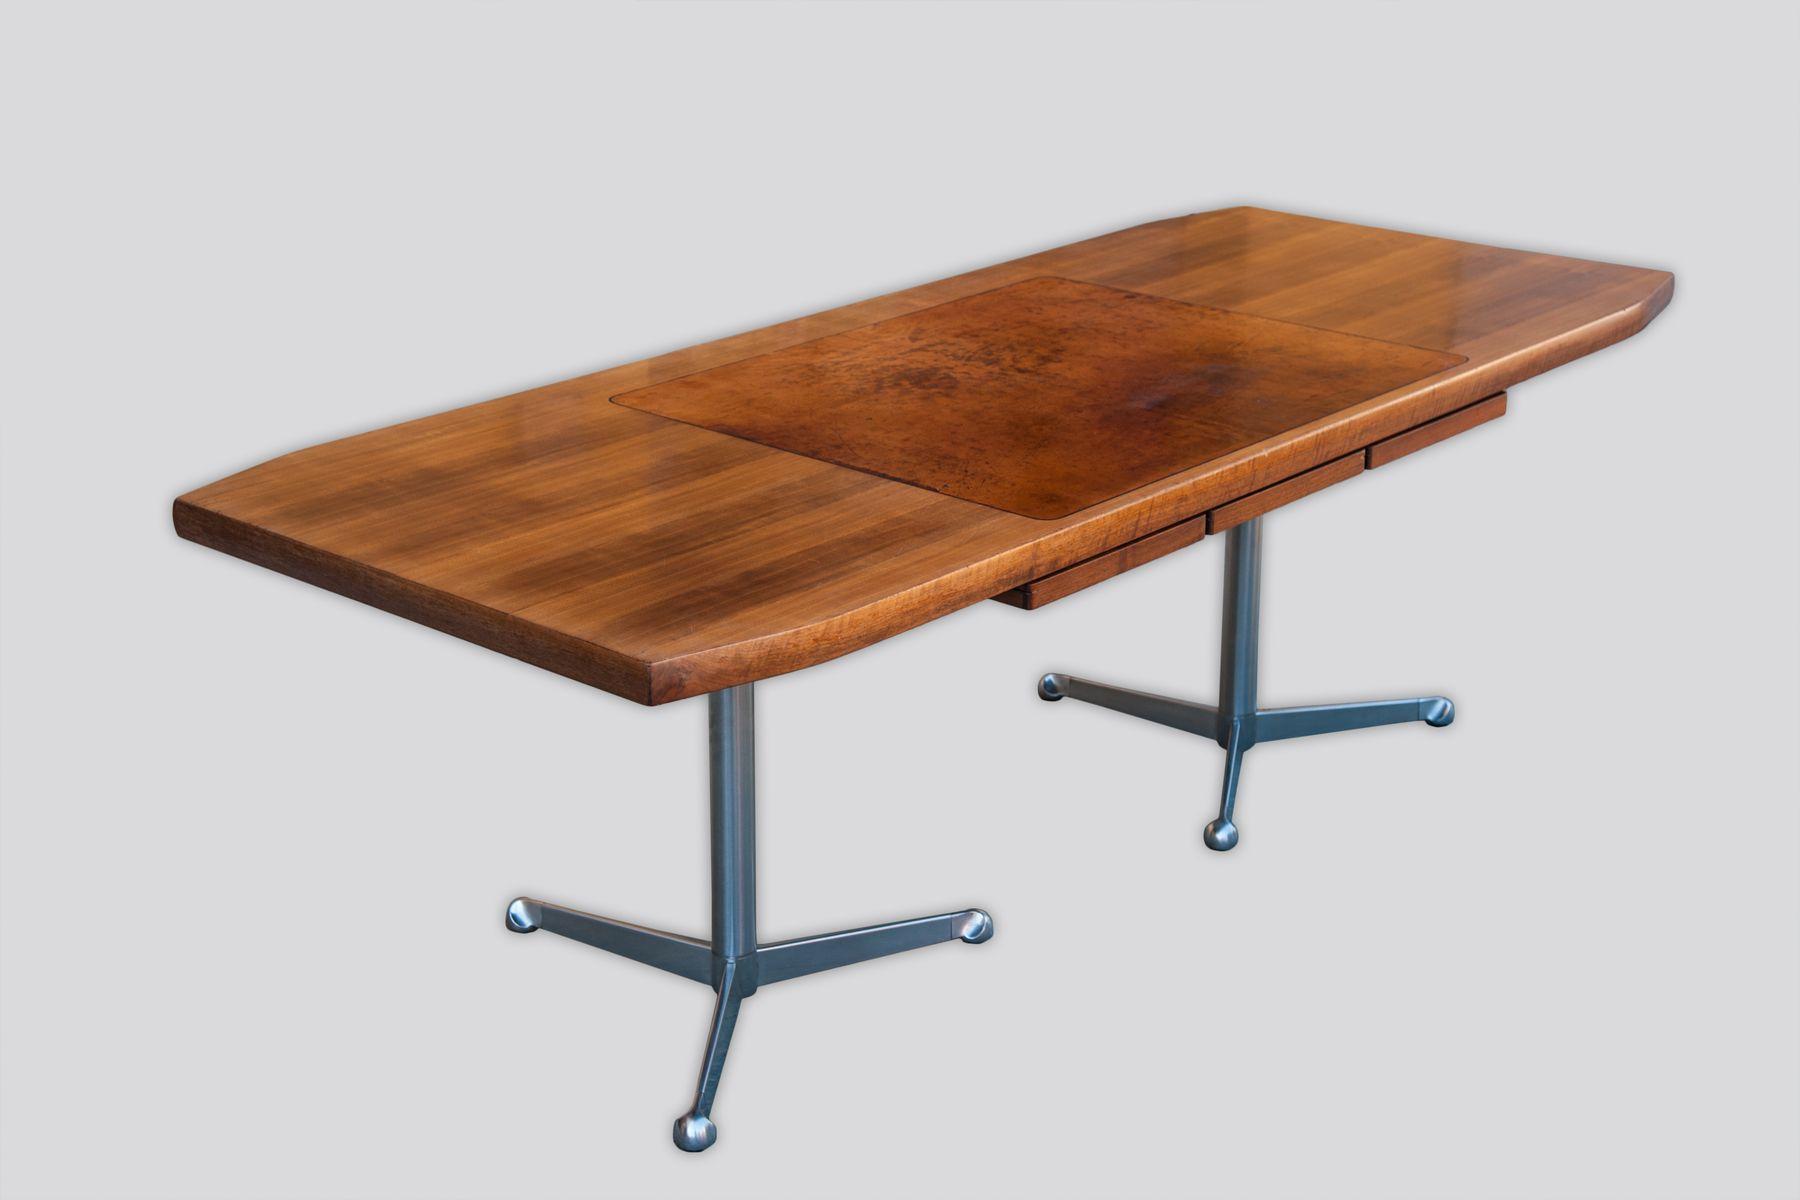 schreibtisch aus verchromtem metall leder nussholz von osvaldo borsani f r tecno 1960er bei. Black Bedroom Furniture Sets. Home Design Ideas